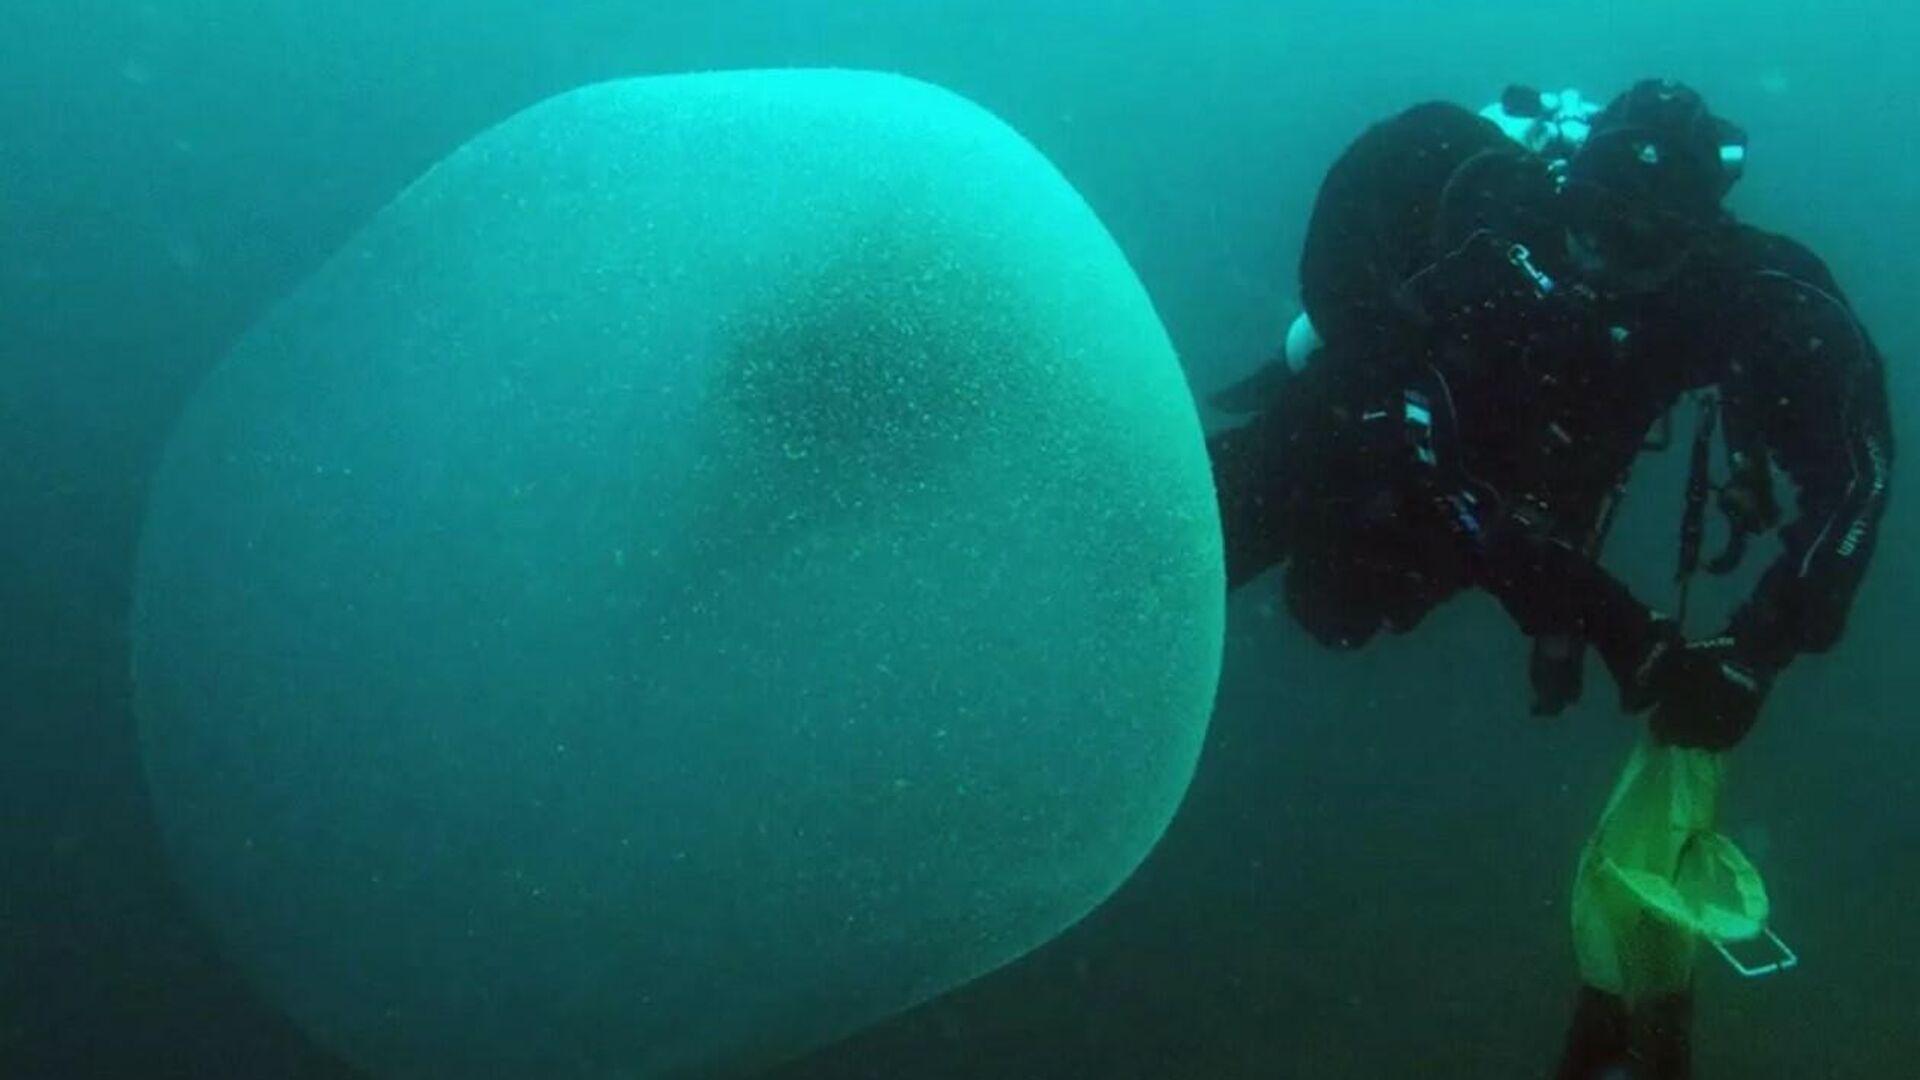 Huevos del calamar Illex Coindetii - Sputnik Mundo, 1920, 04.04.2021